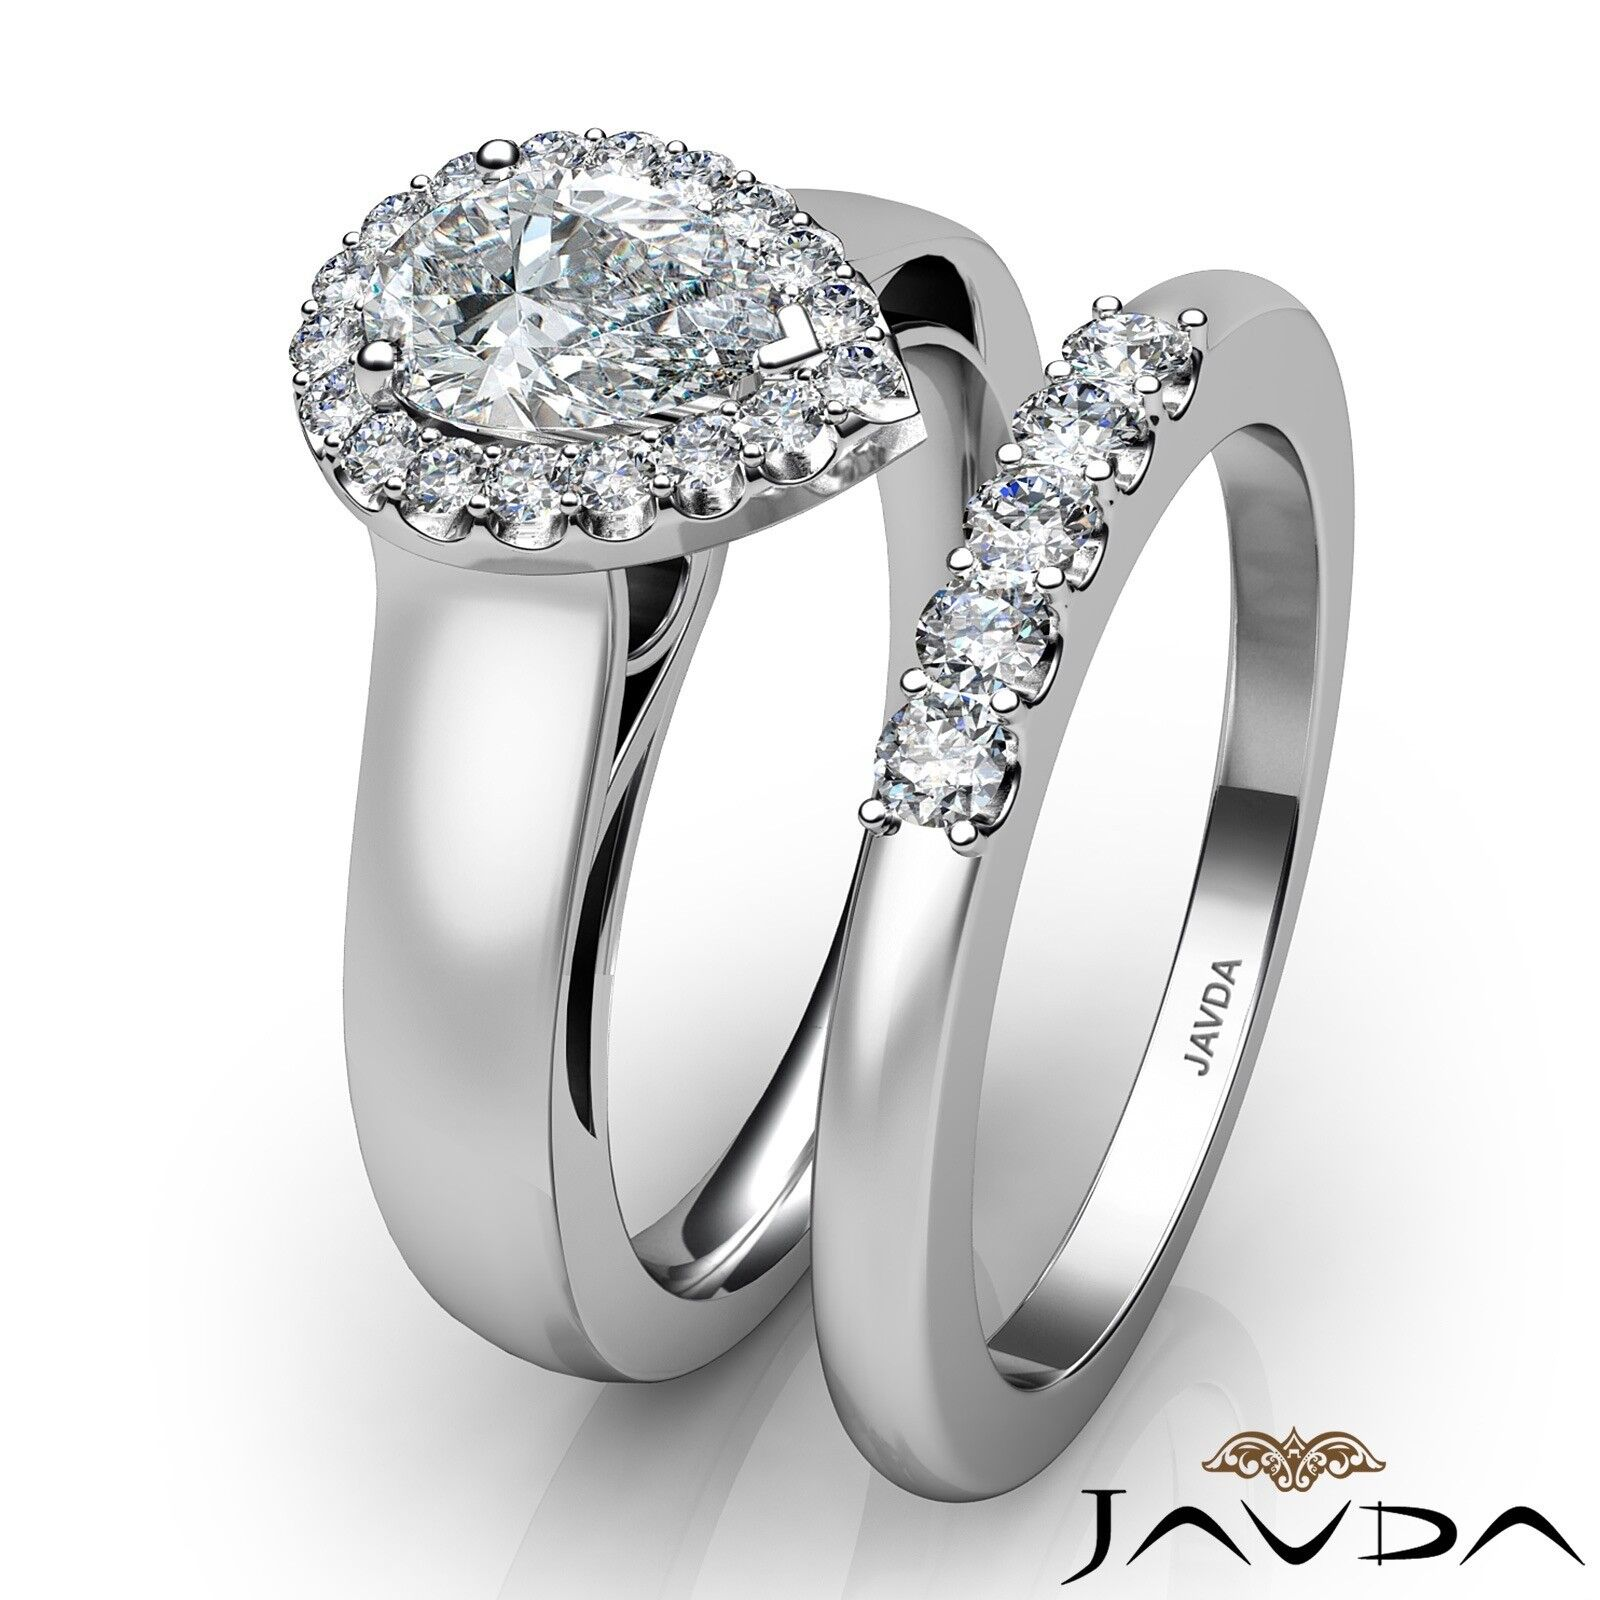 1.33ctw U Cut Pave Set Halo Bridal Pear Diamond Engagement Ring GIA F-VS2 W Gold 3